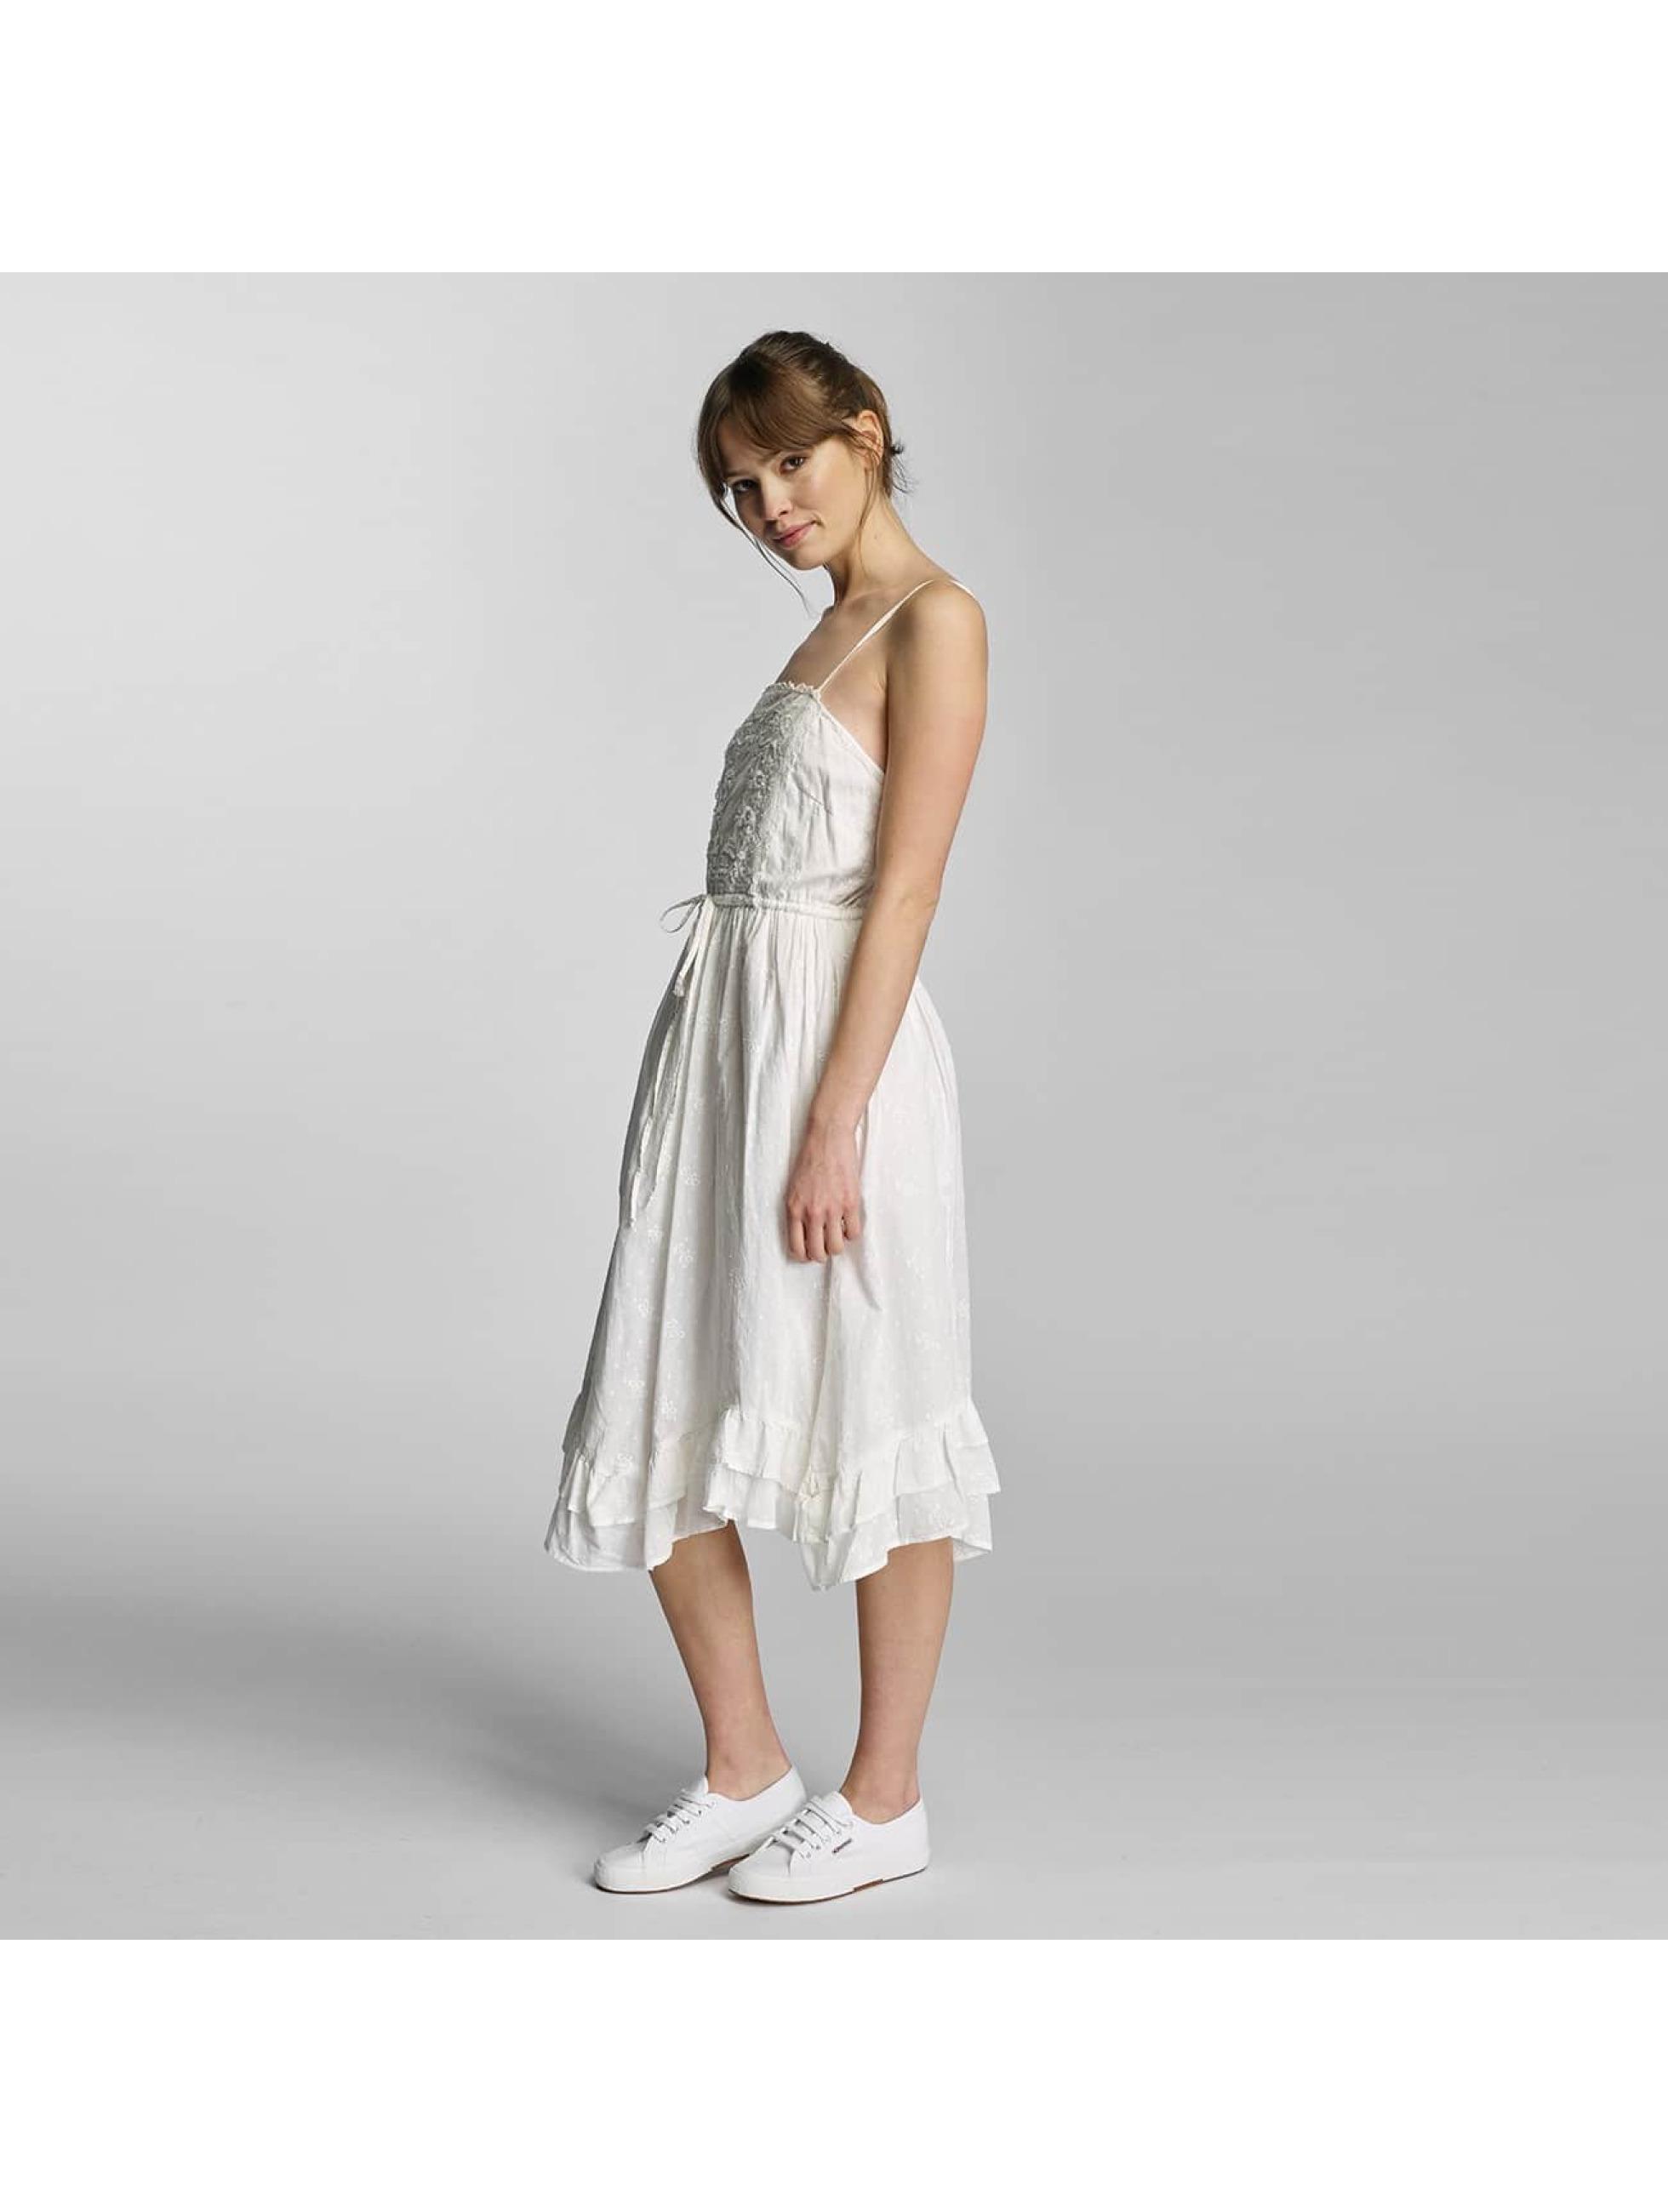 Vero Moda Kjoler VmLana hvid